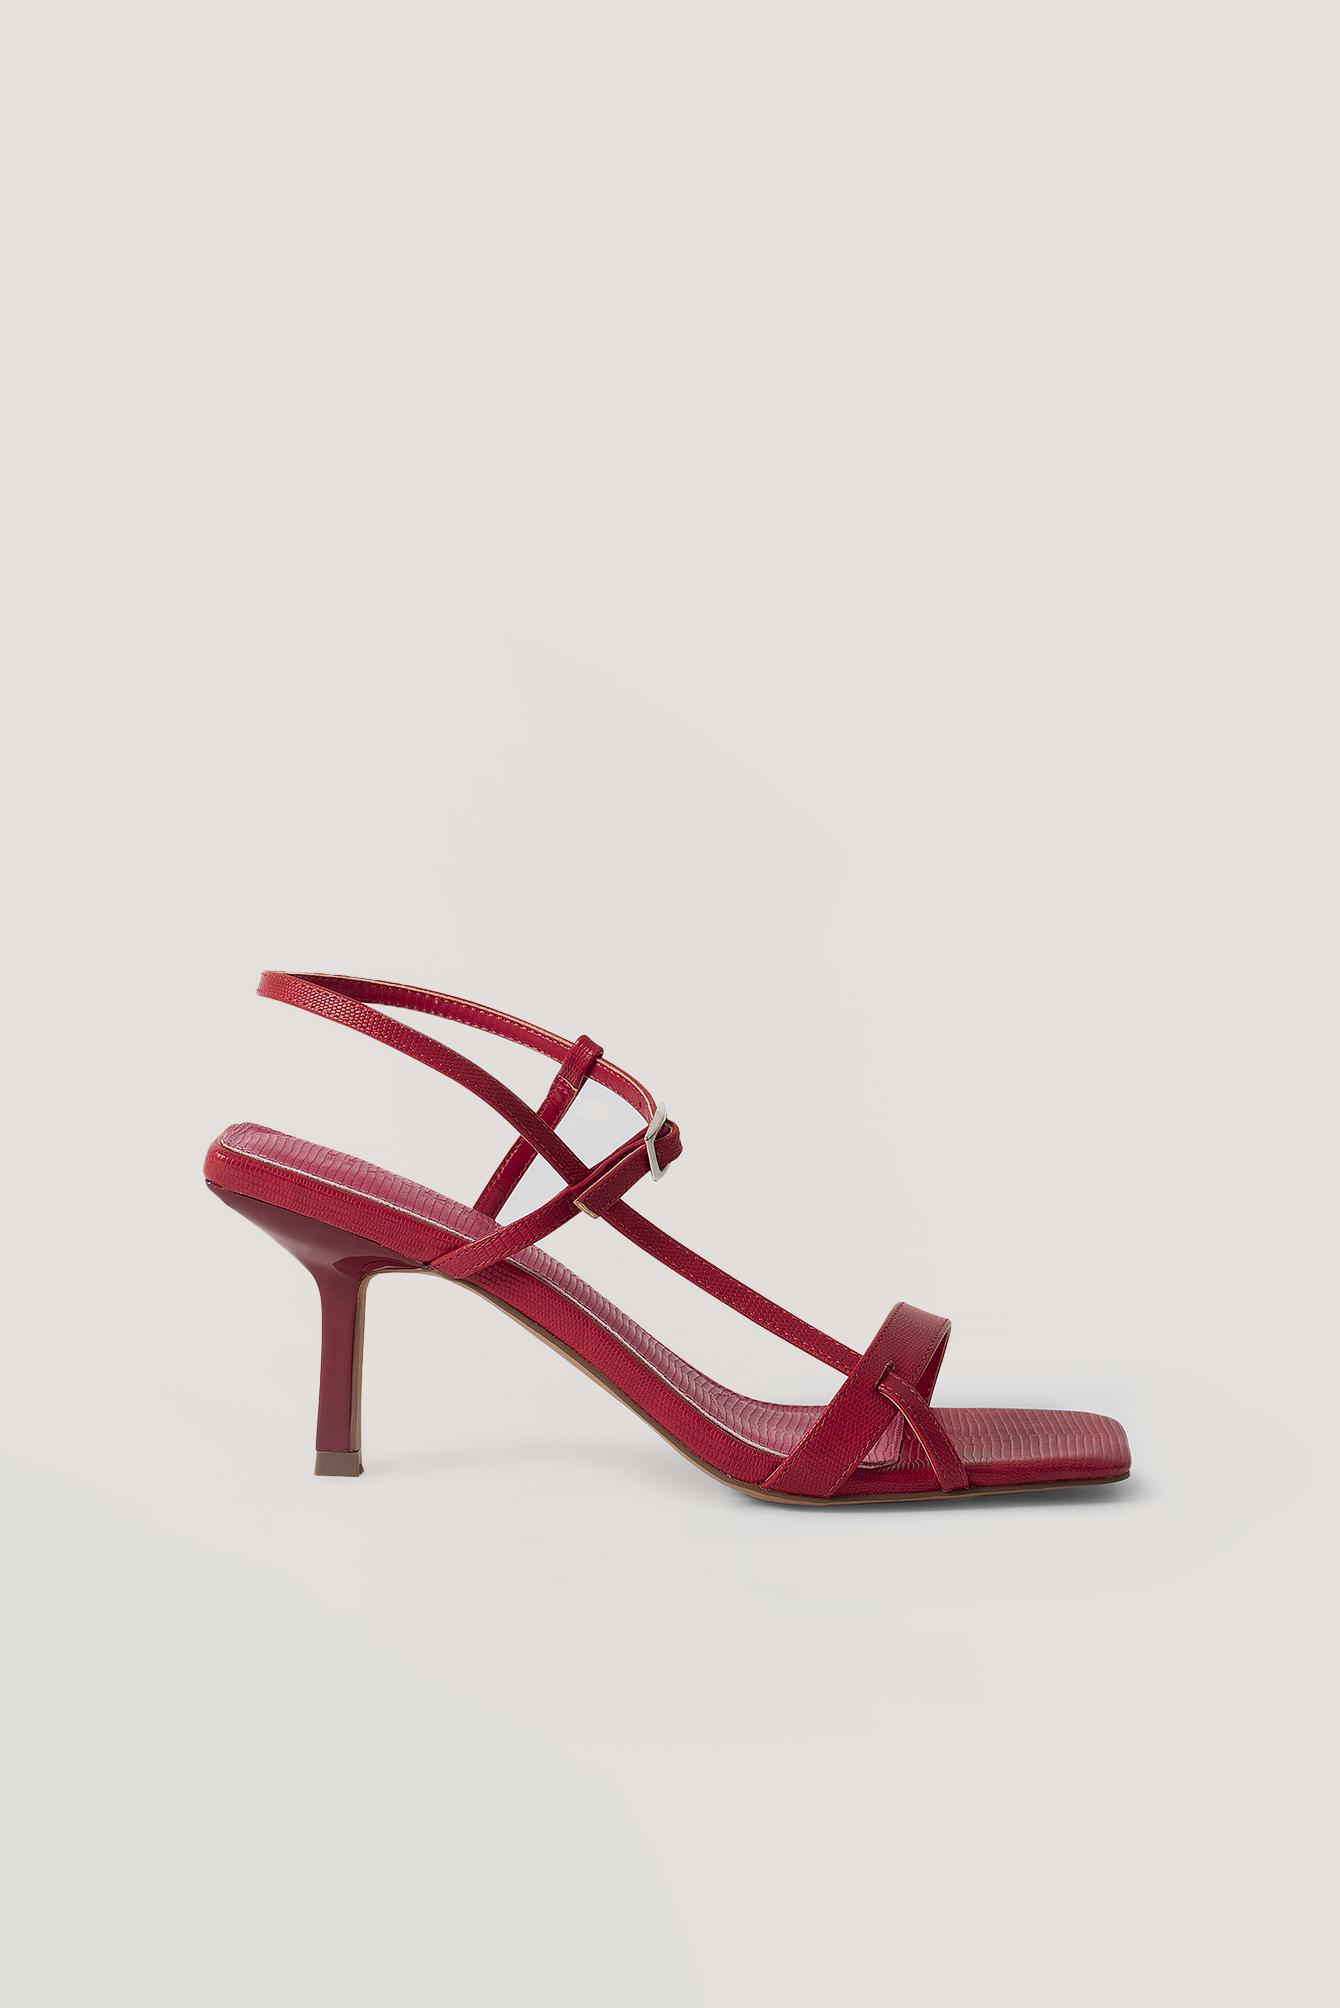 na-kd shoes -  Multischnalle Quadratisch - Red